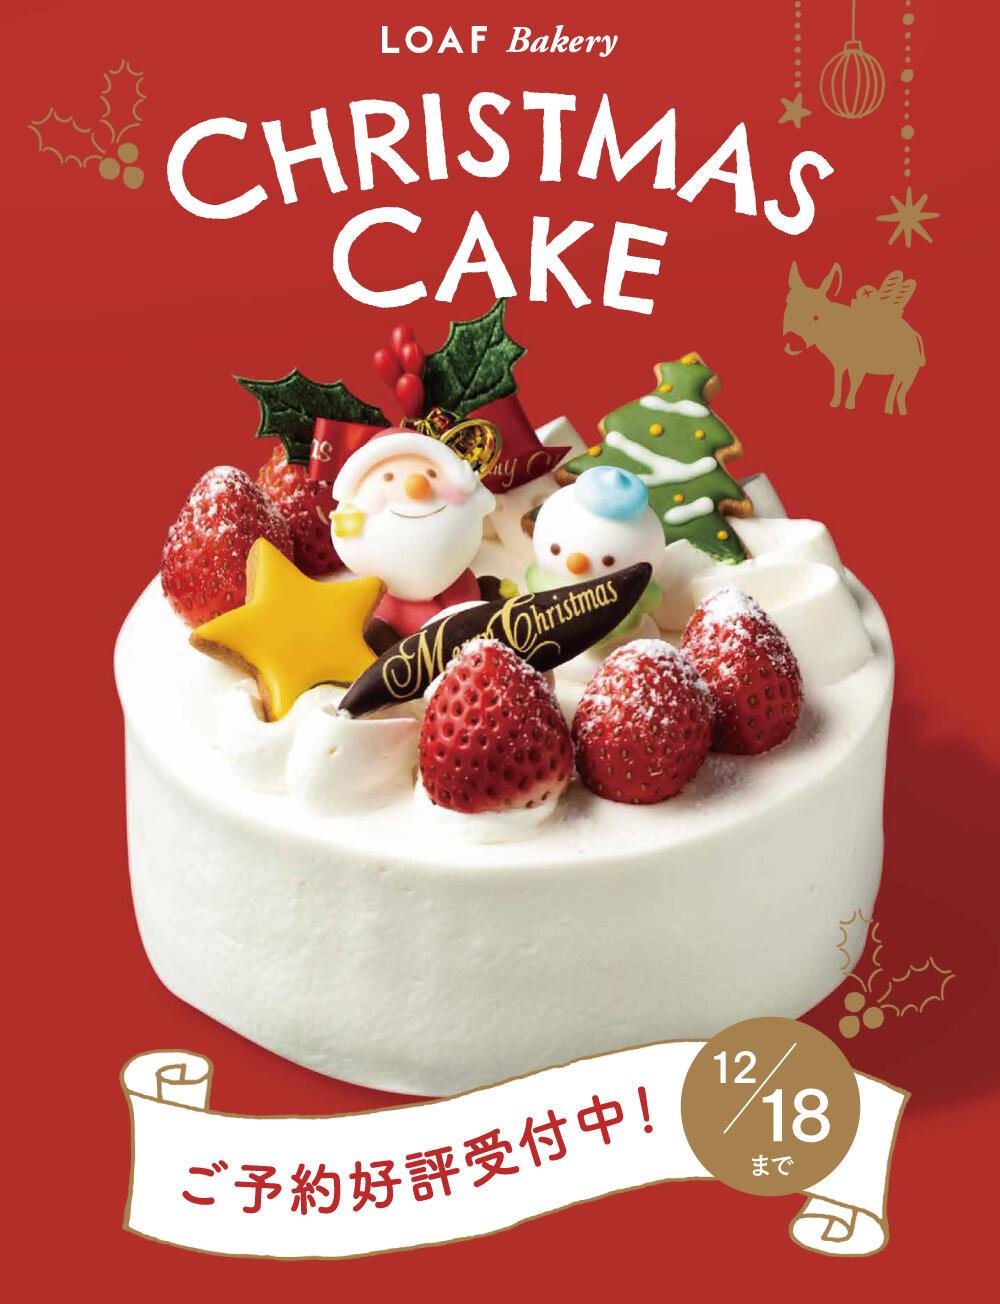 loaf_2011_xmas-cake_1.jpg